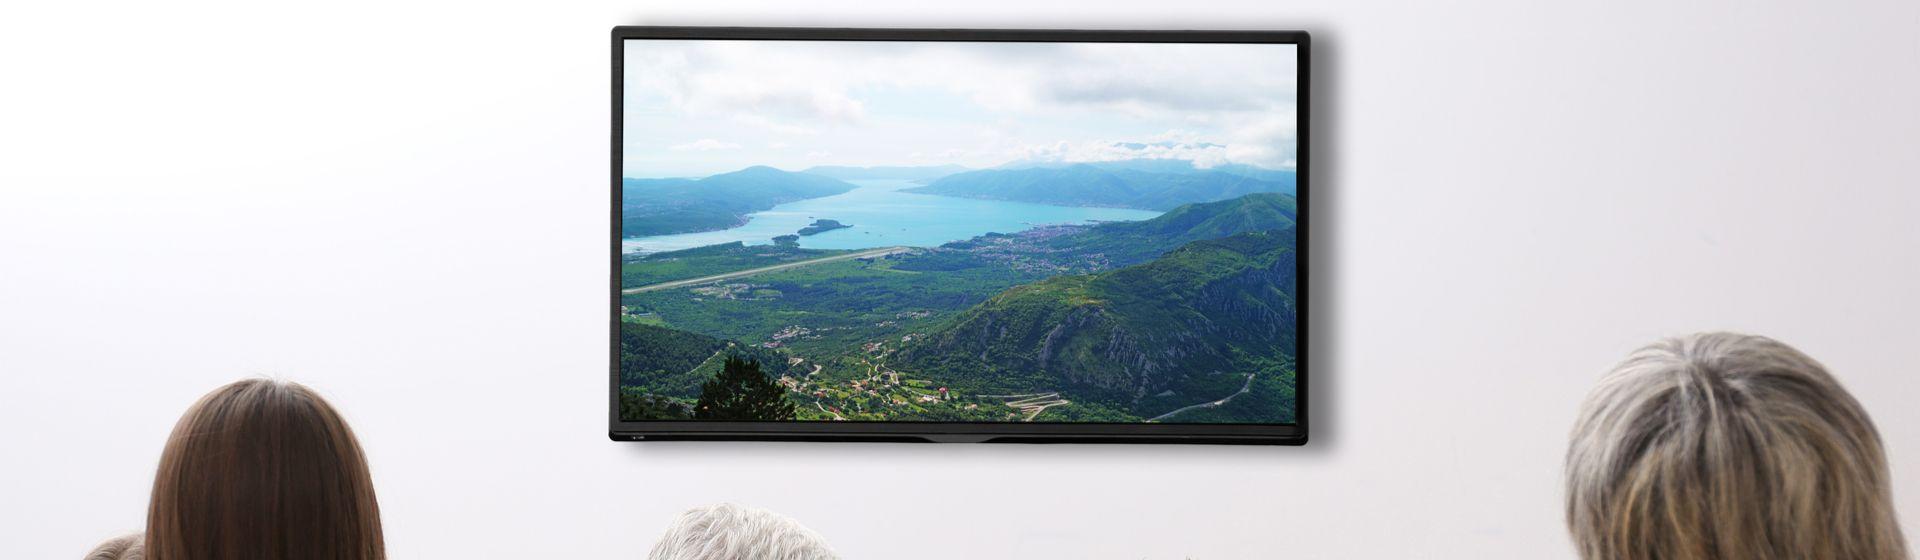 TV TCL S6500 de 32 polegadas é boa? Confira a análise de ficha técnica dessa smart TV